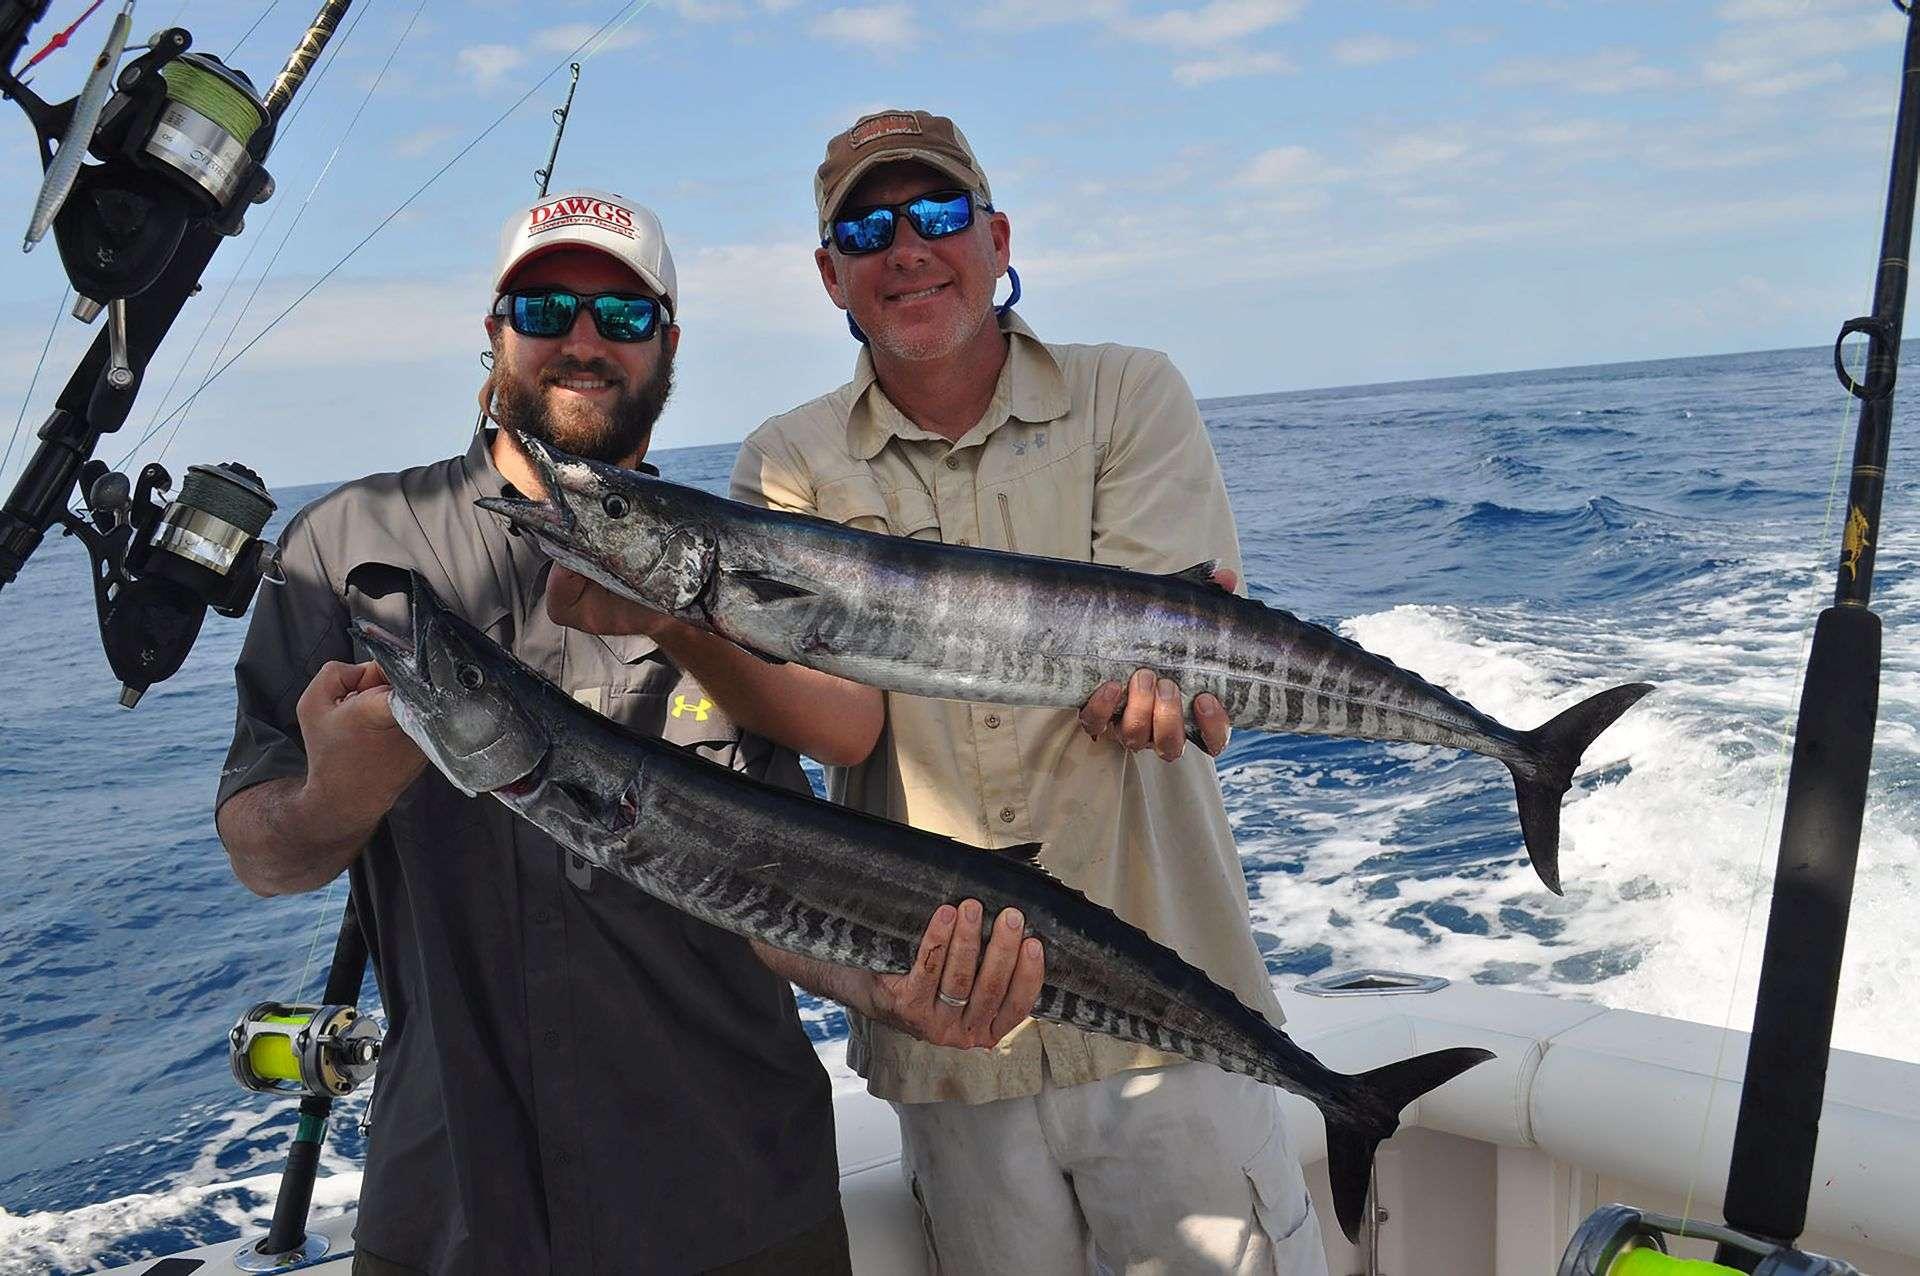 Sport fishing - pesca deportiva,, Bahía de Drake, Drake Bay,